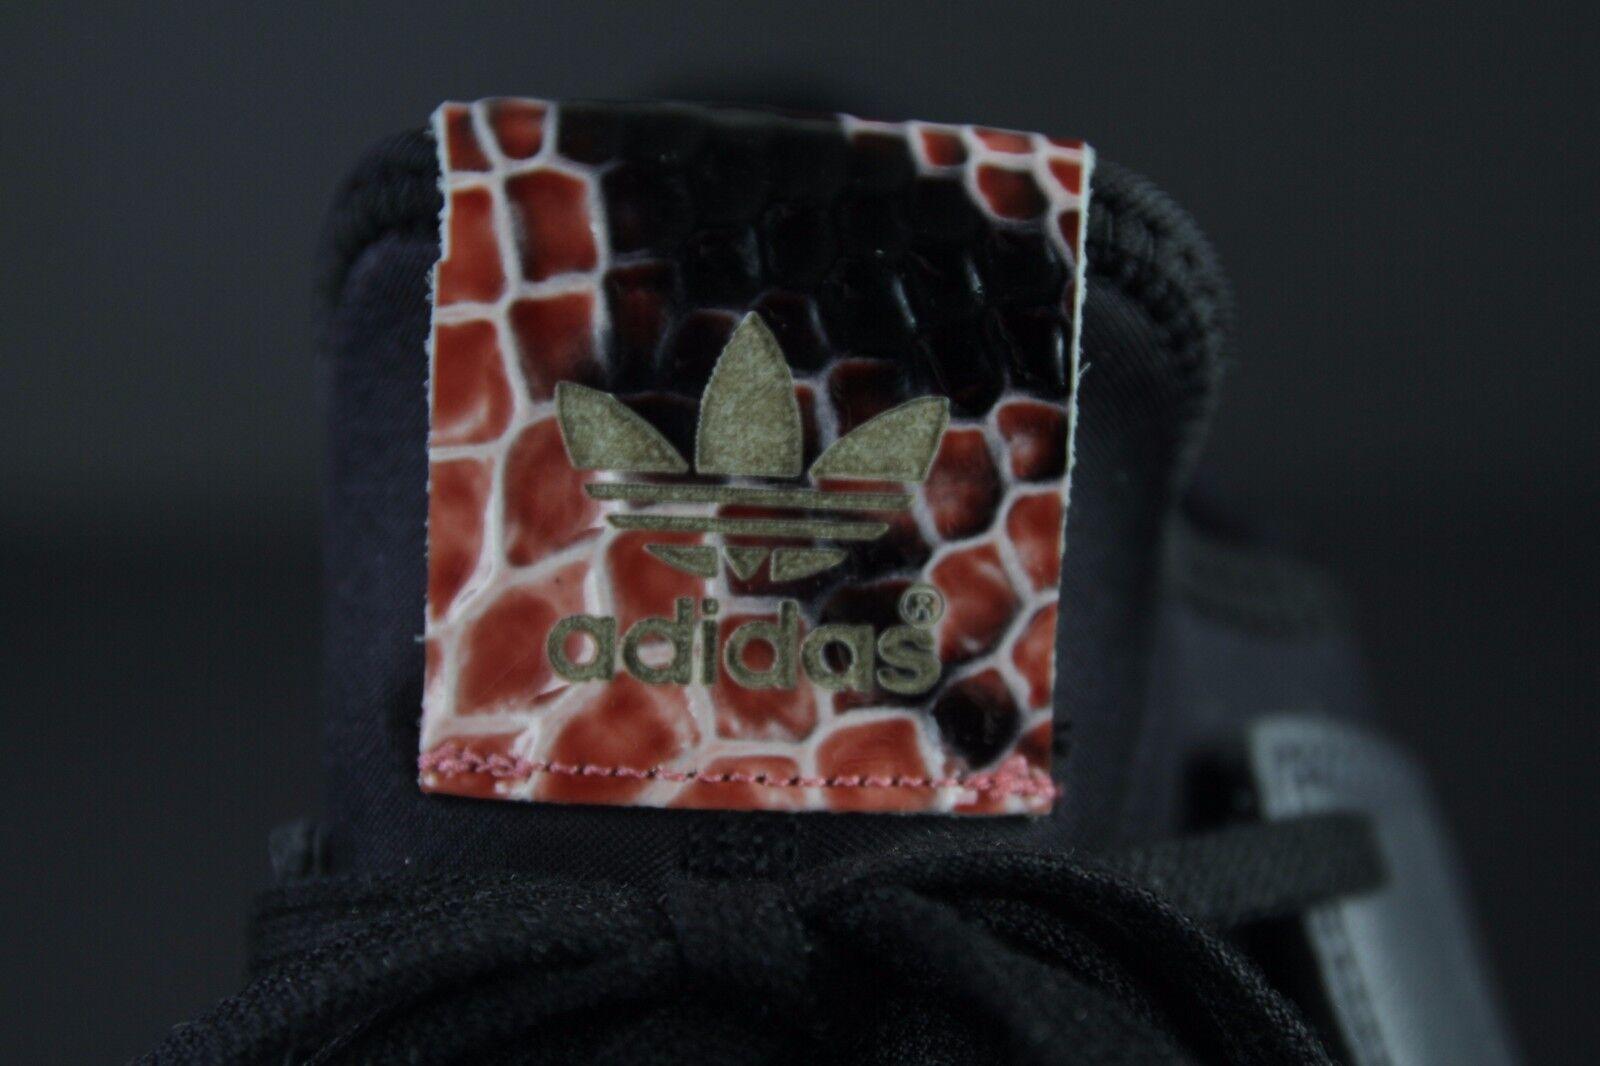 - verkauf.adidas s79049 s79049 s79049 neu!selten!original zx flux plus kern schwarz / rot 13,5 abn 51e529